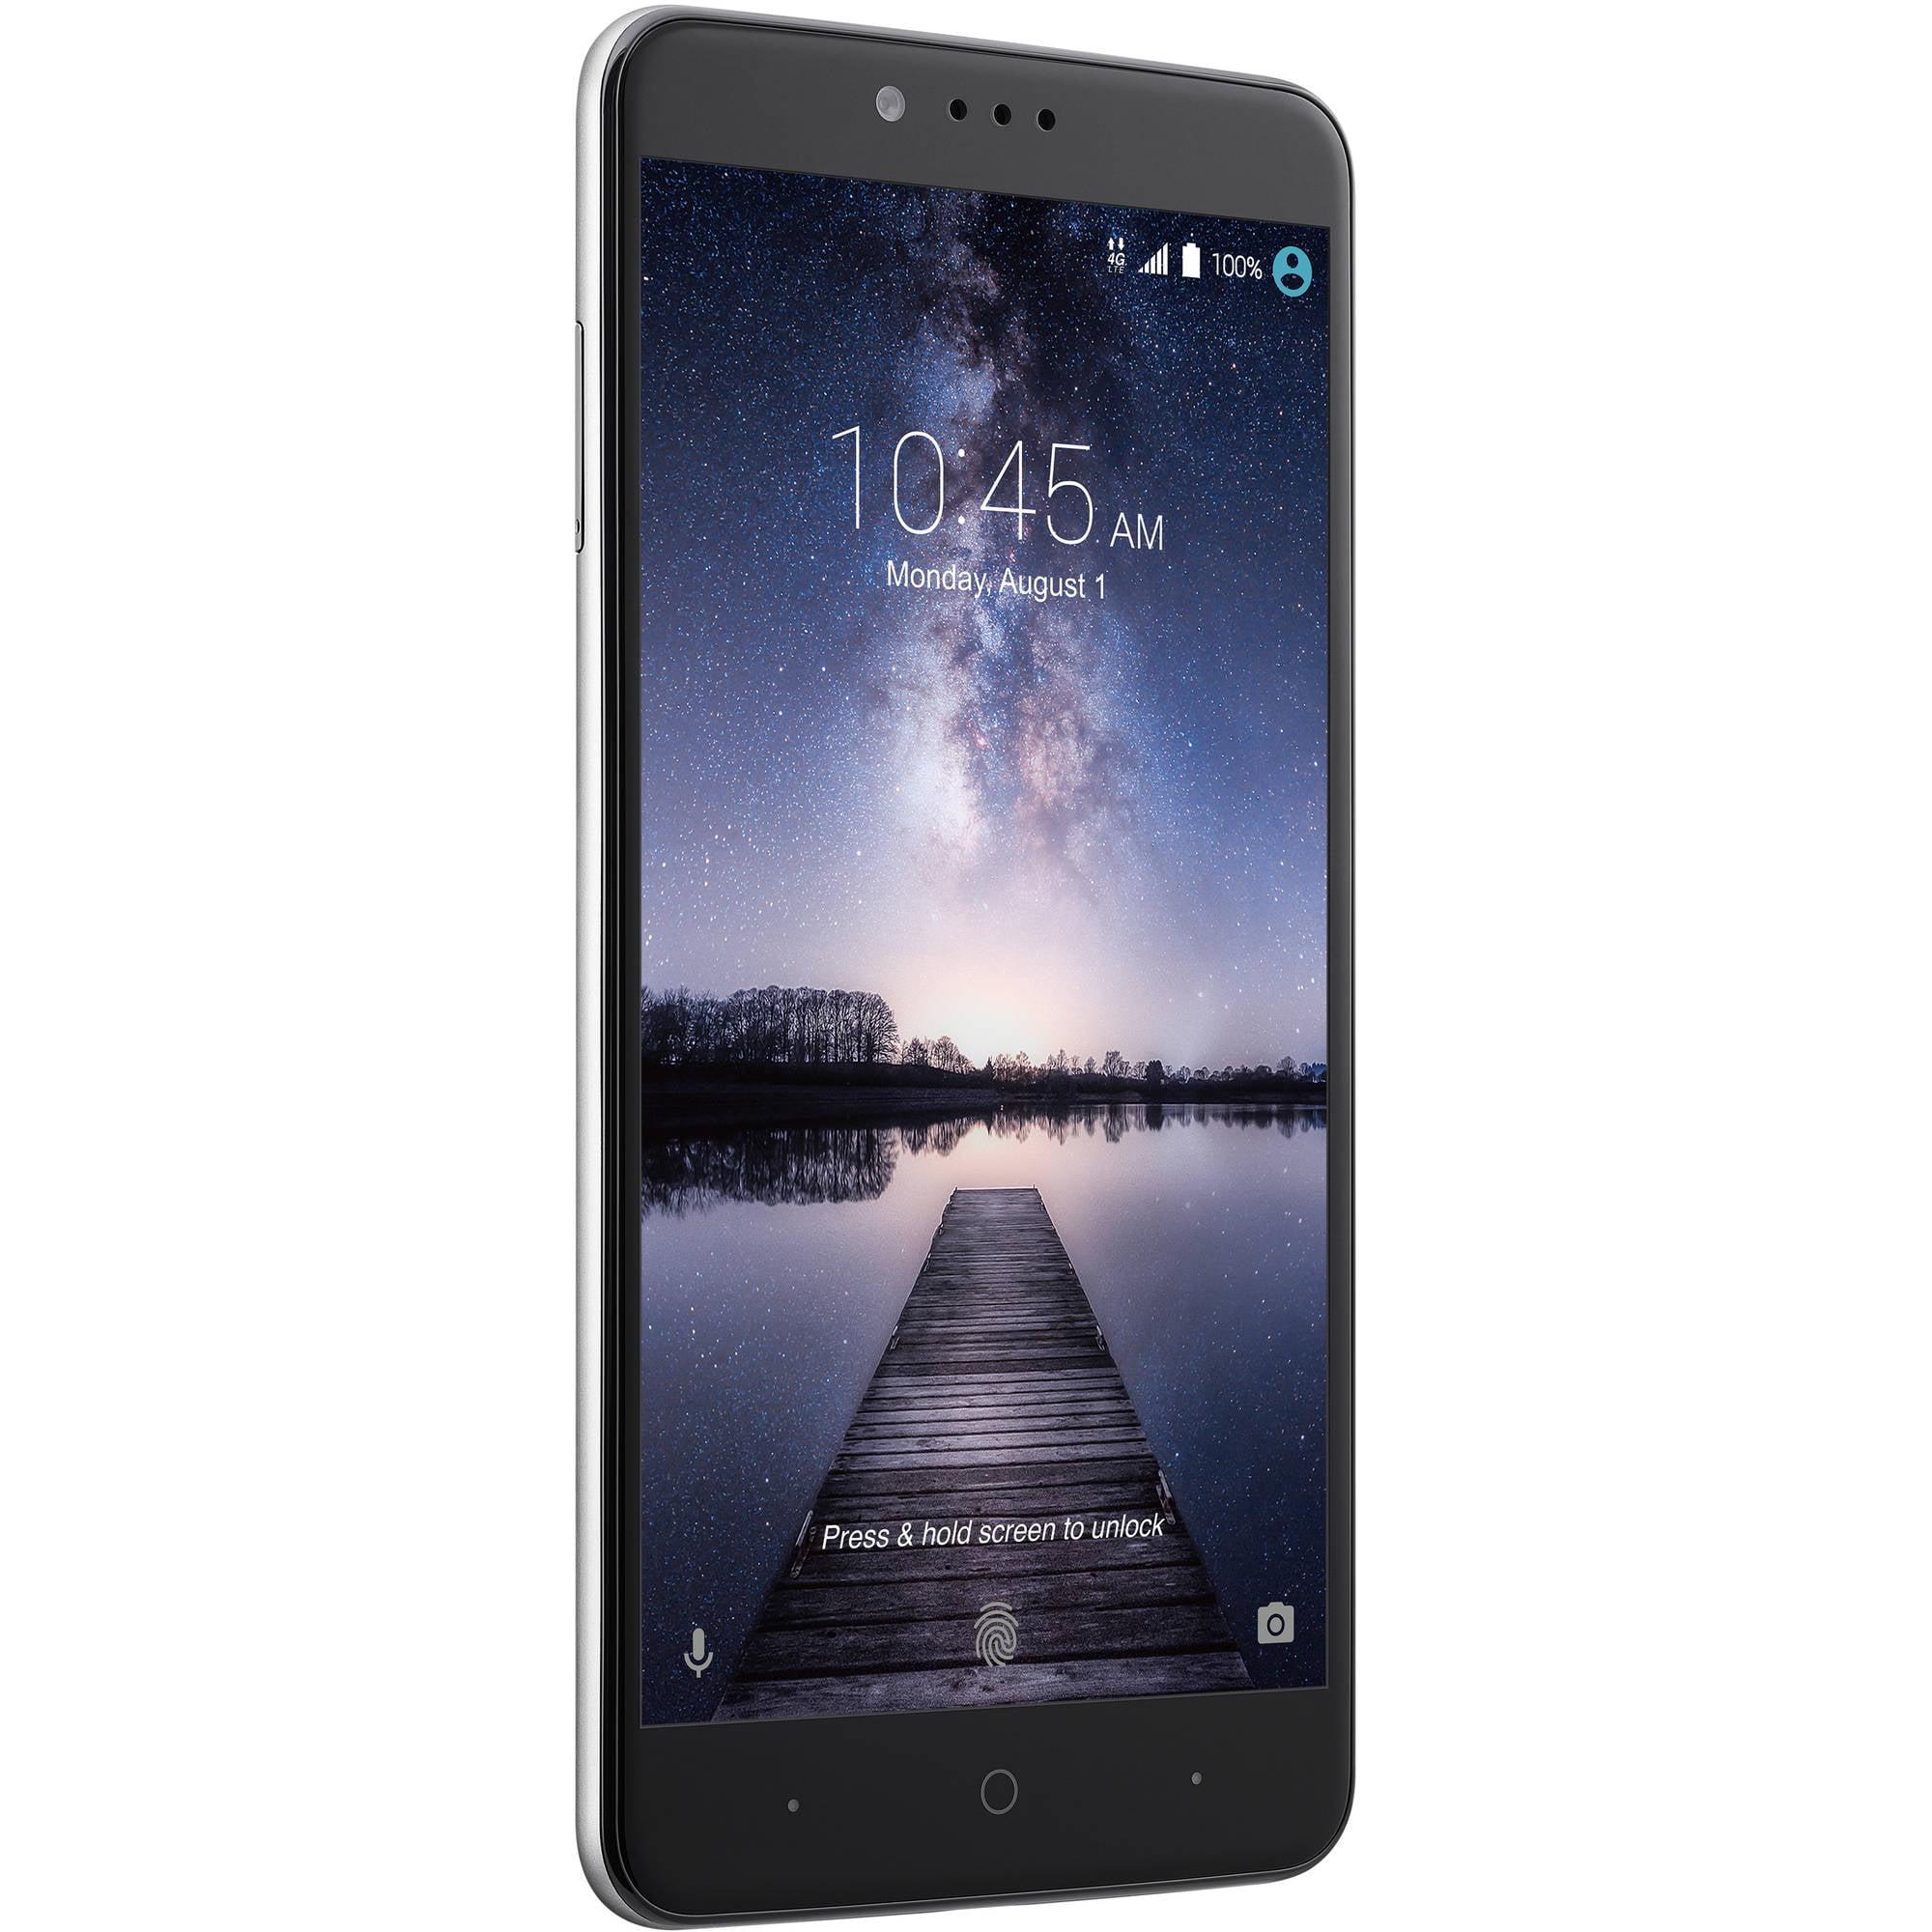 Walmart Family Mobile ZTE ZMAX PRO Prepaid Camera Phone by ZTE